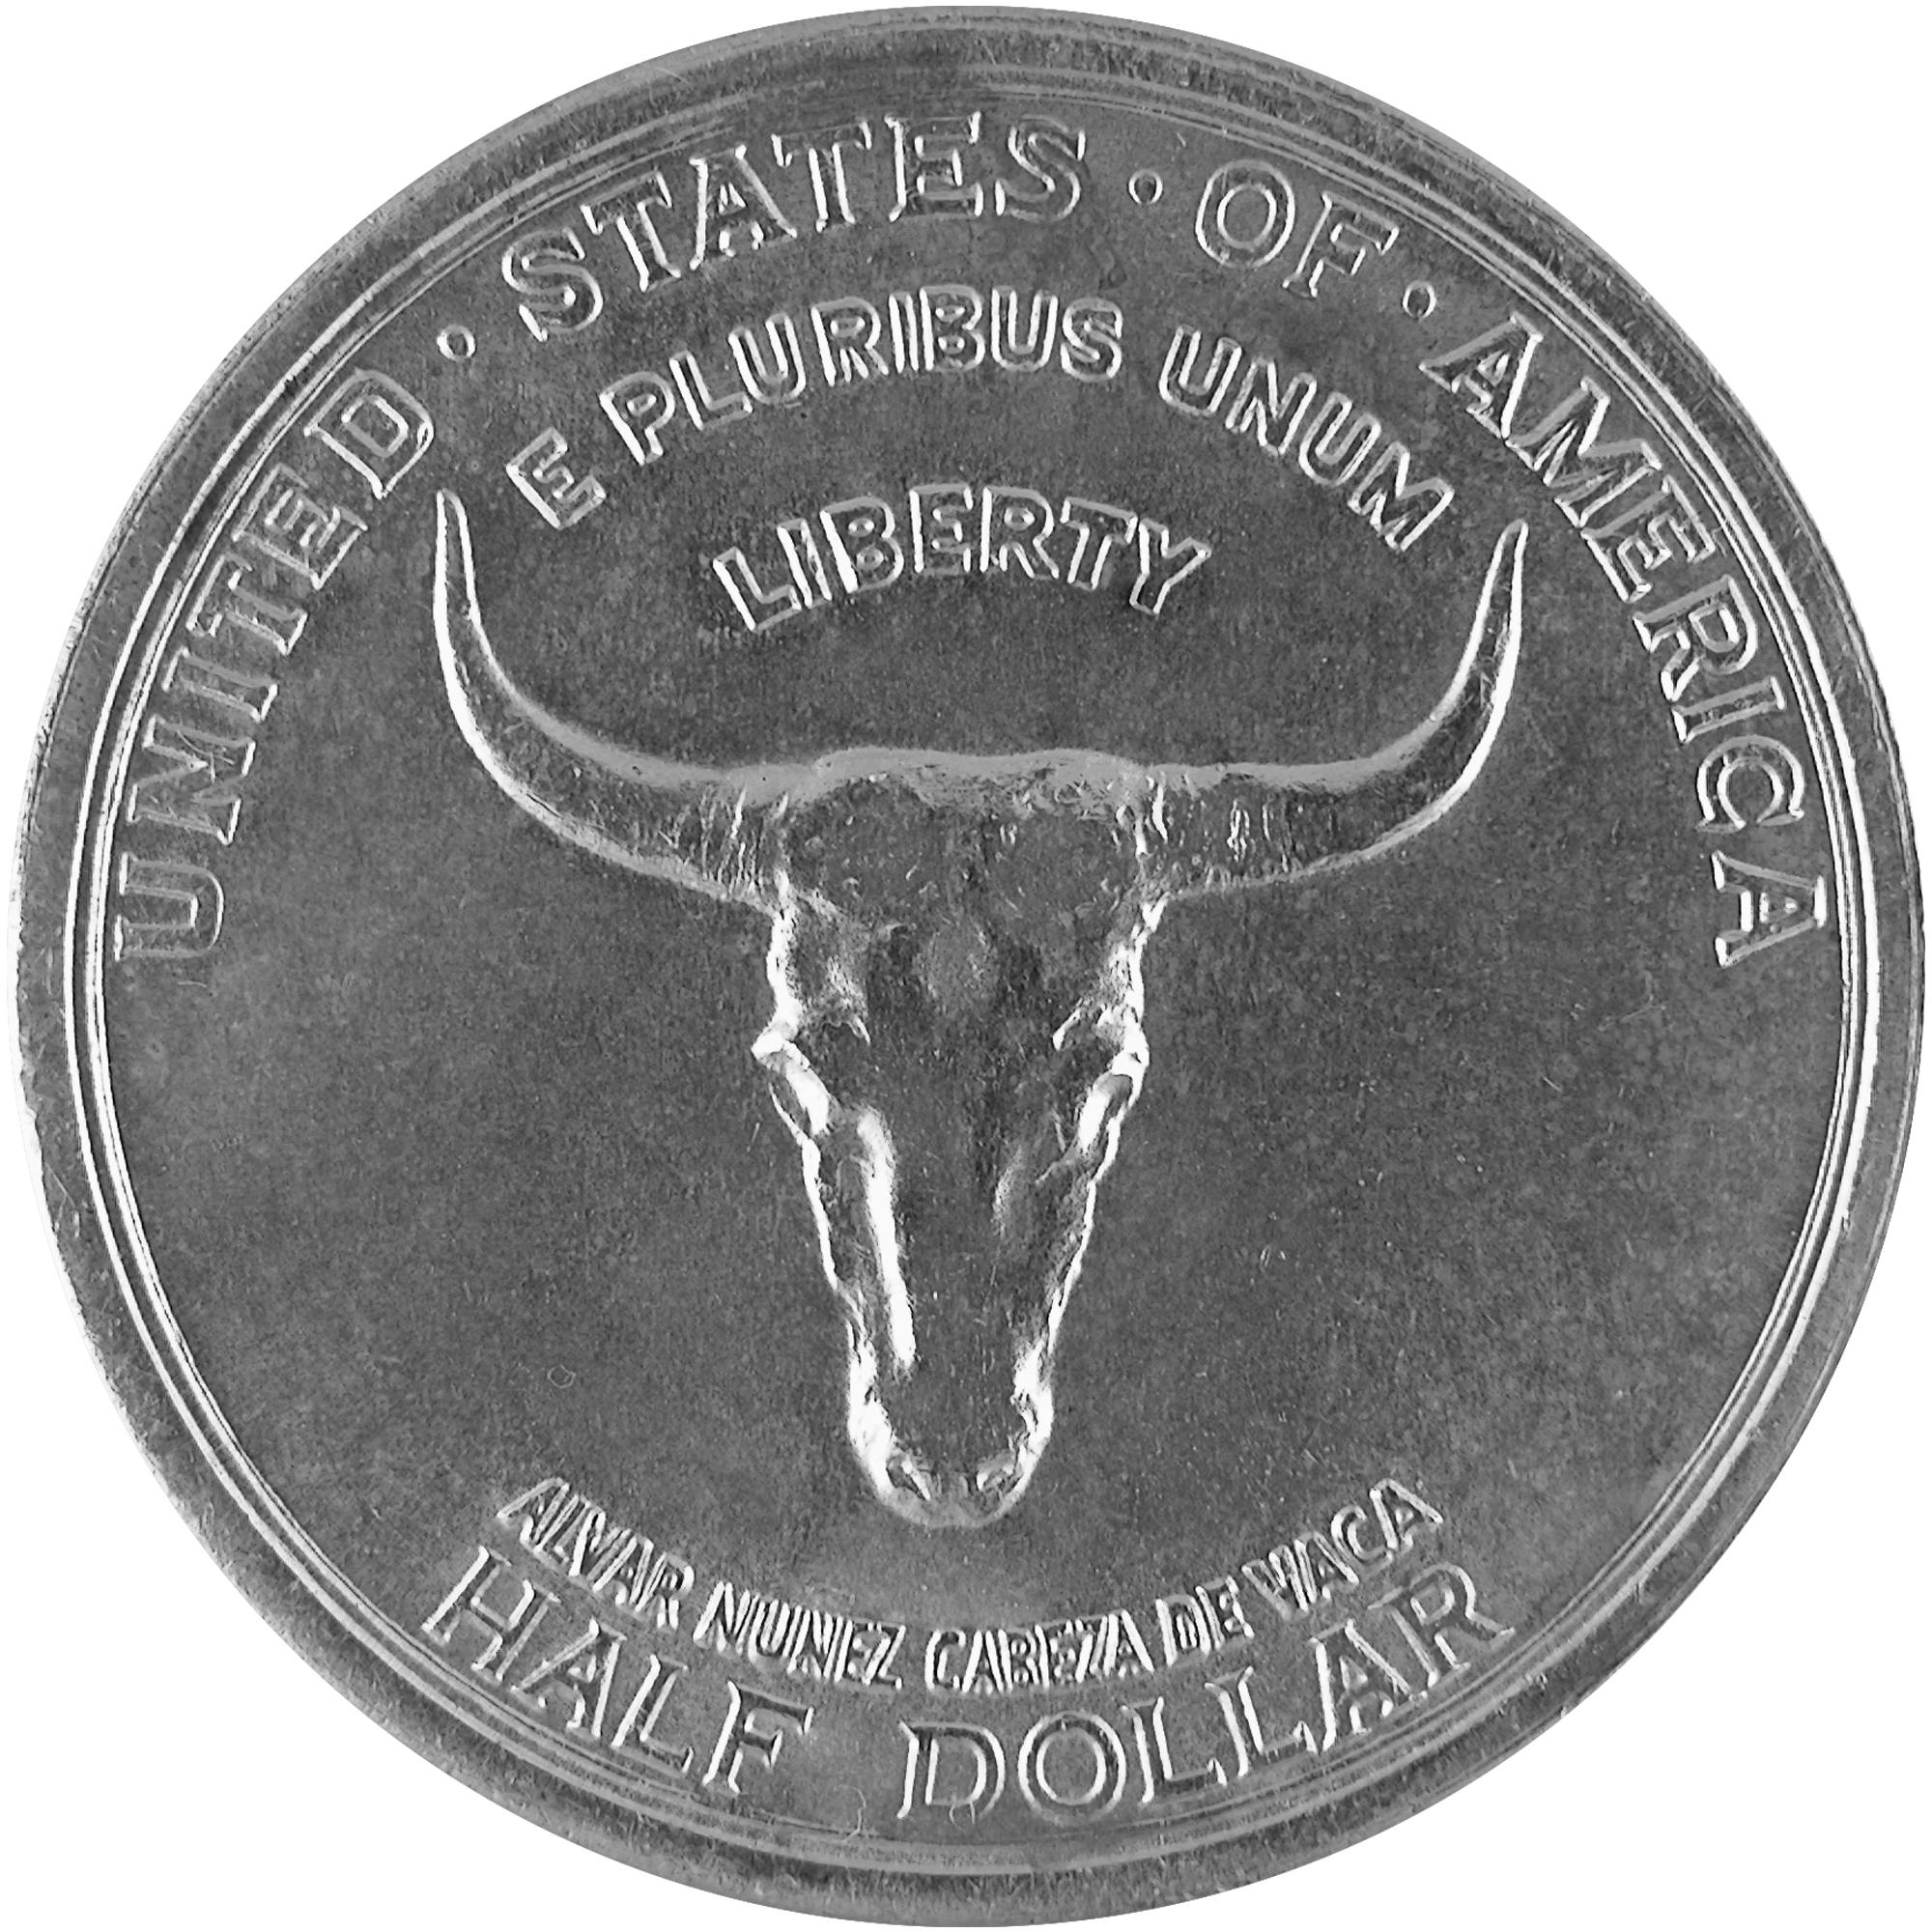 1935 Old Spanish Trail Quadricentennial Commemorative Silver Half Dollar Coin Obverse